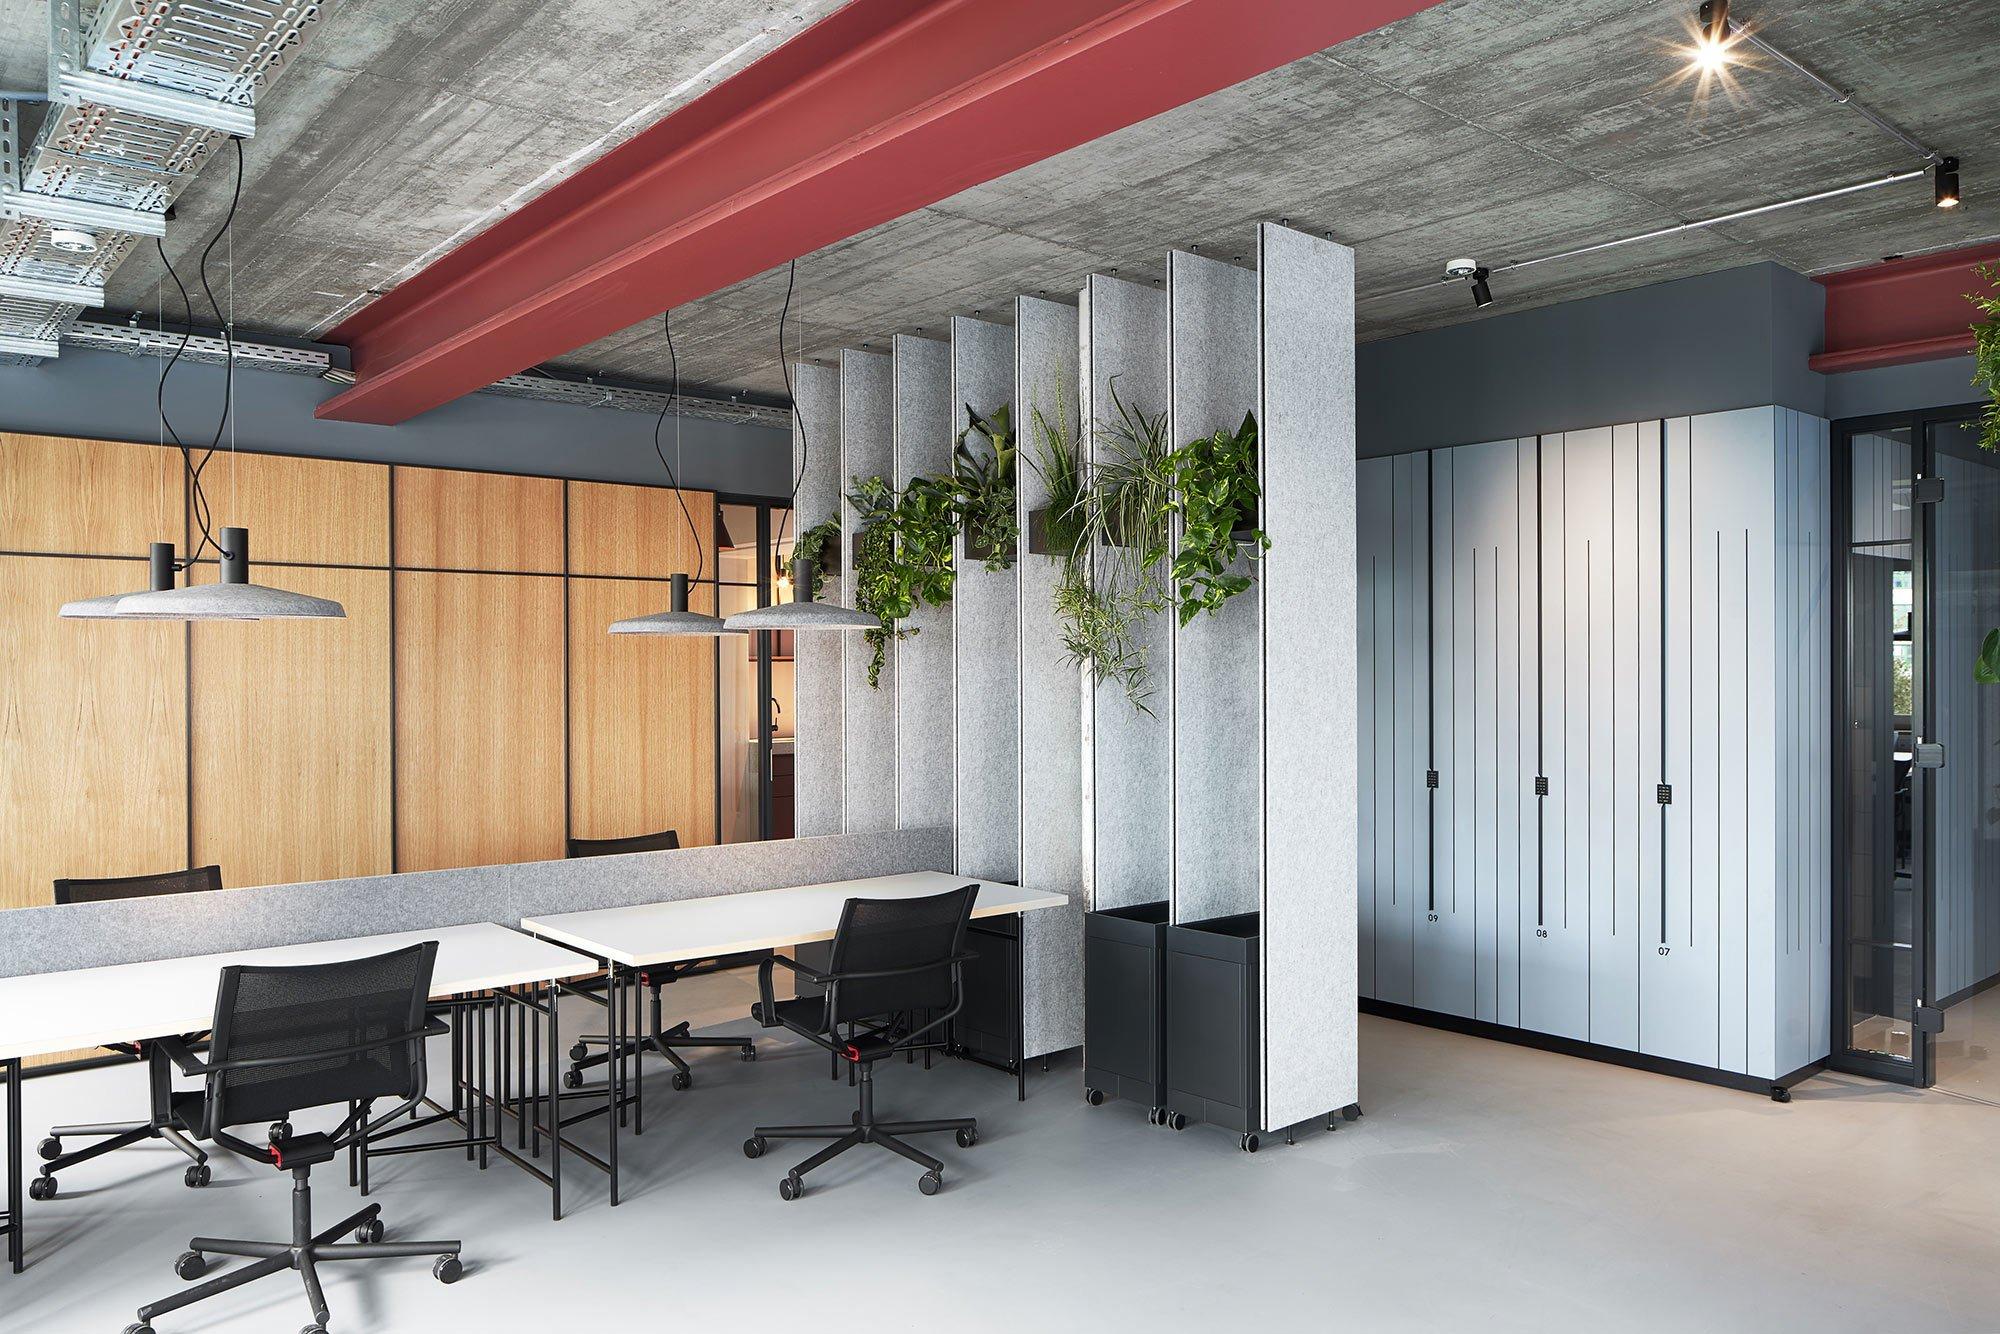 Coworking Space Urban Spaces, Stuttgart, Foto: Philip Kottlorz